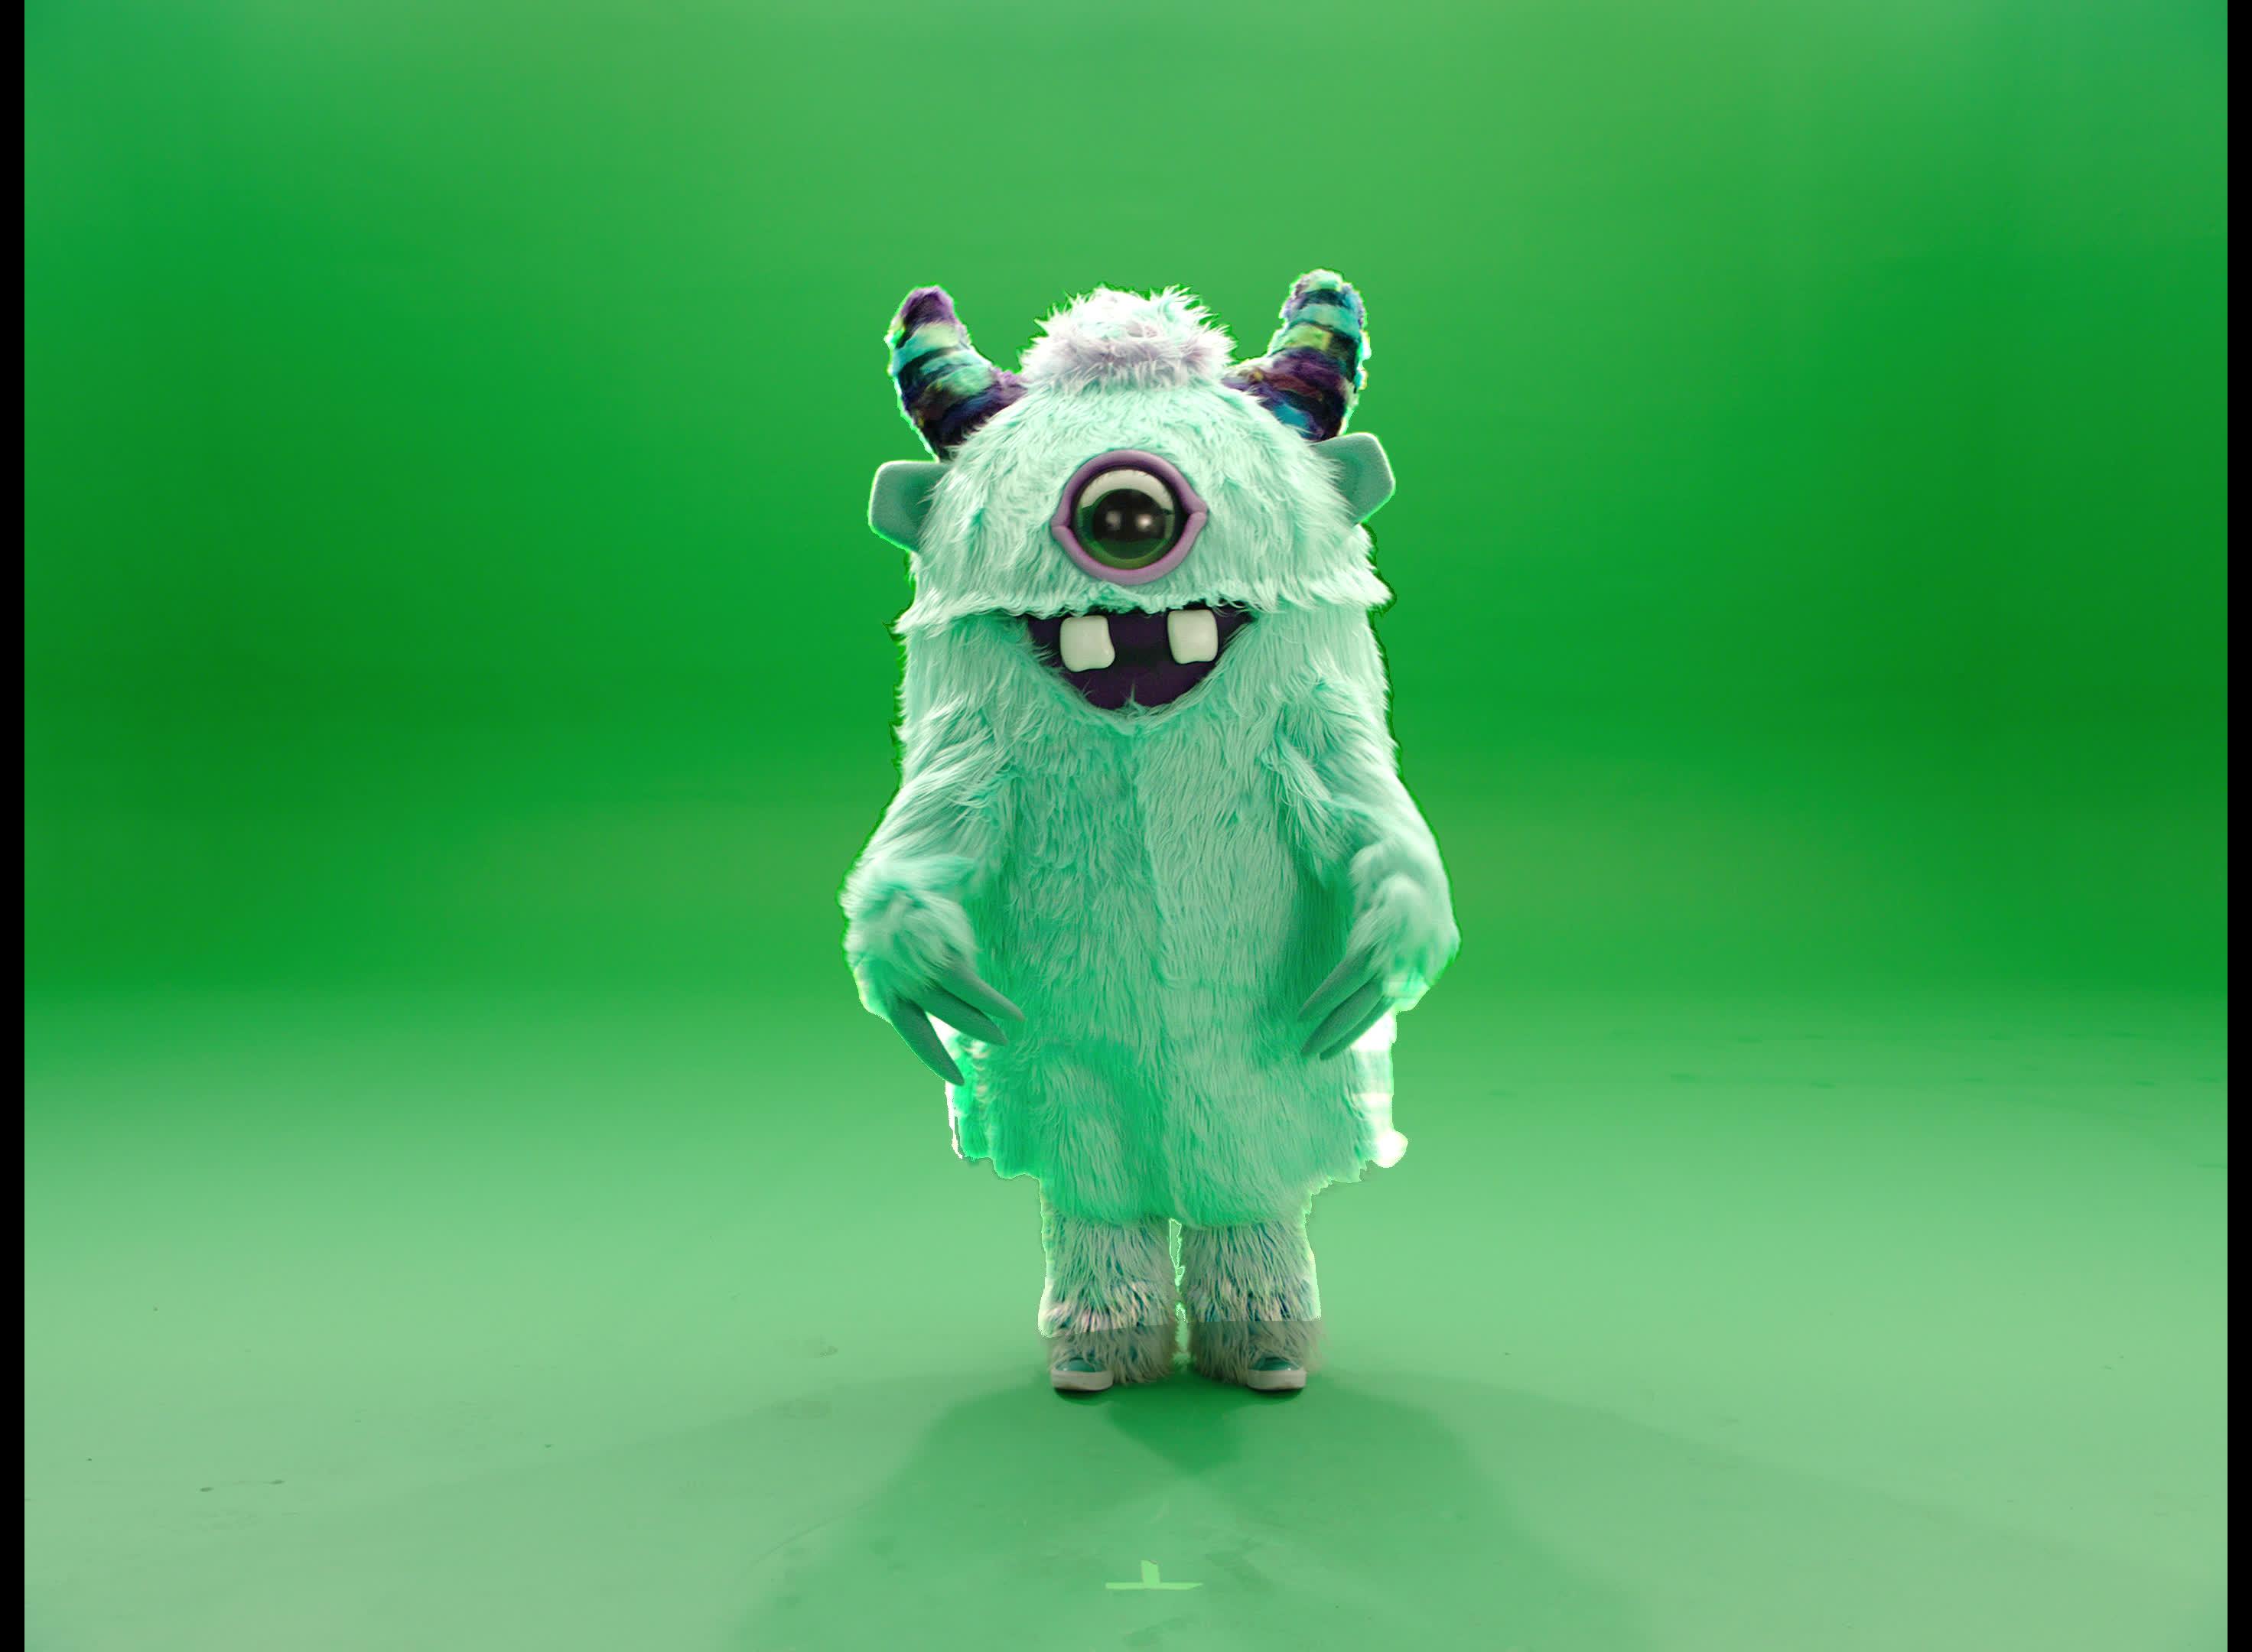 awww, cute, hi, masked singer, monster, pose, posing, running, the masked singer, the masked singer on fox, wave, Cute Monster GIFs